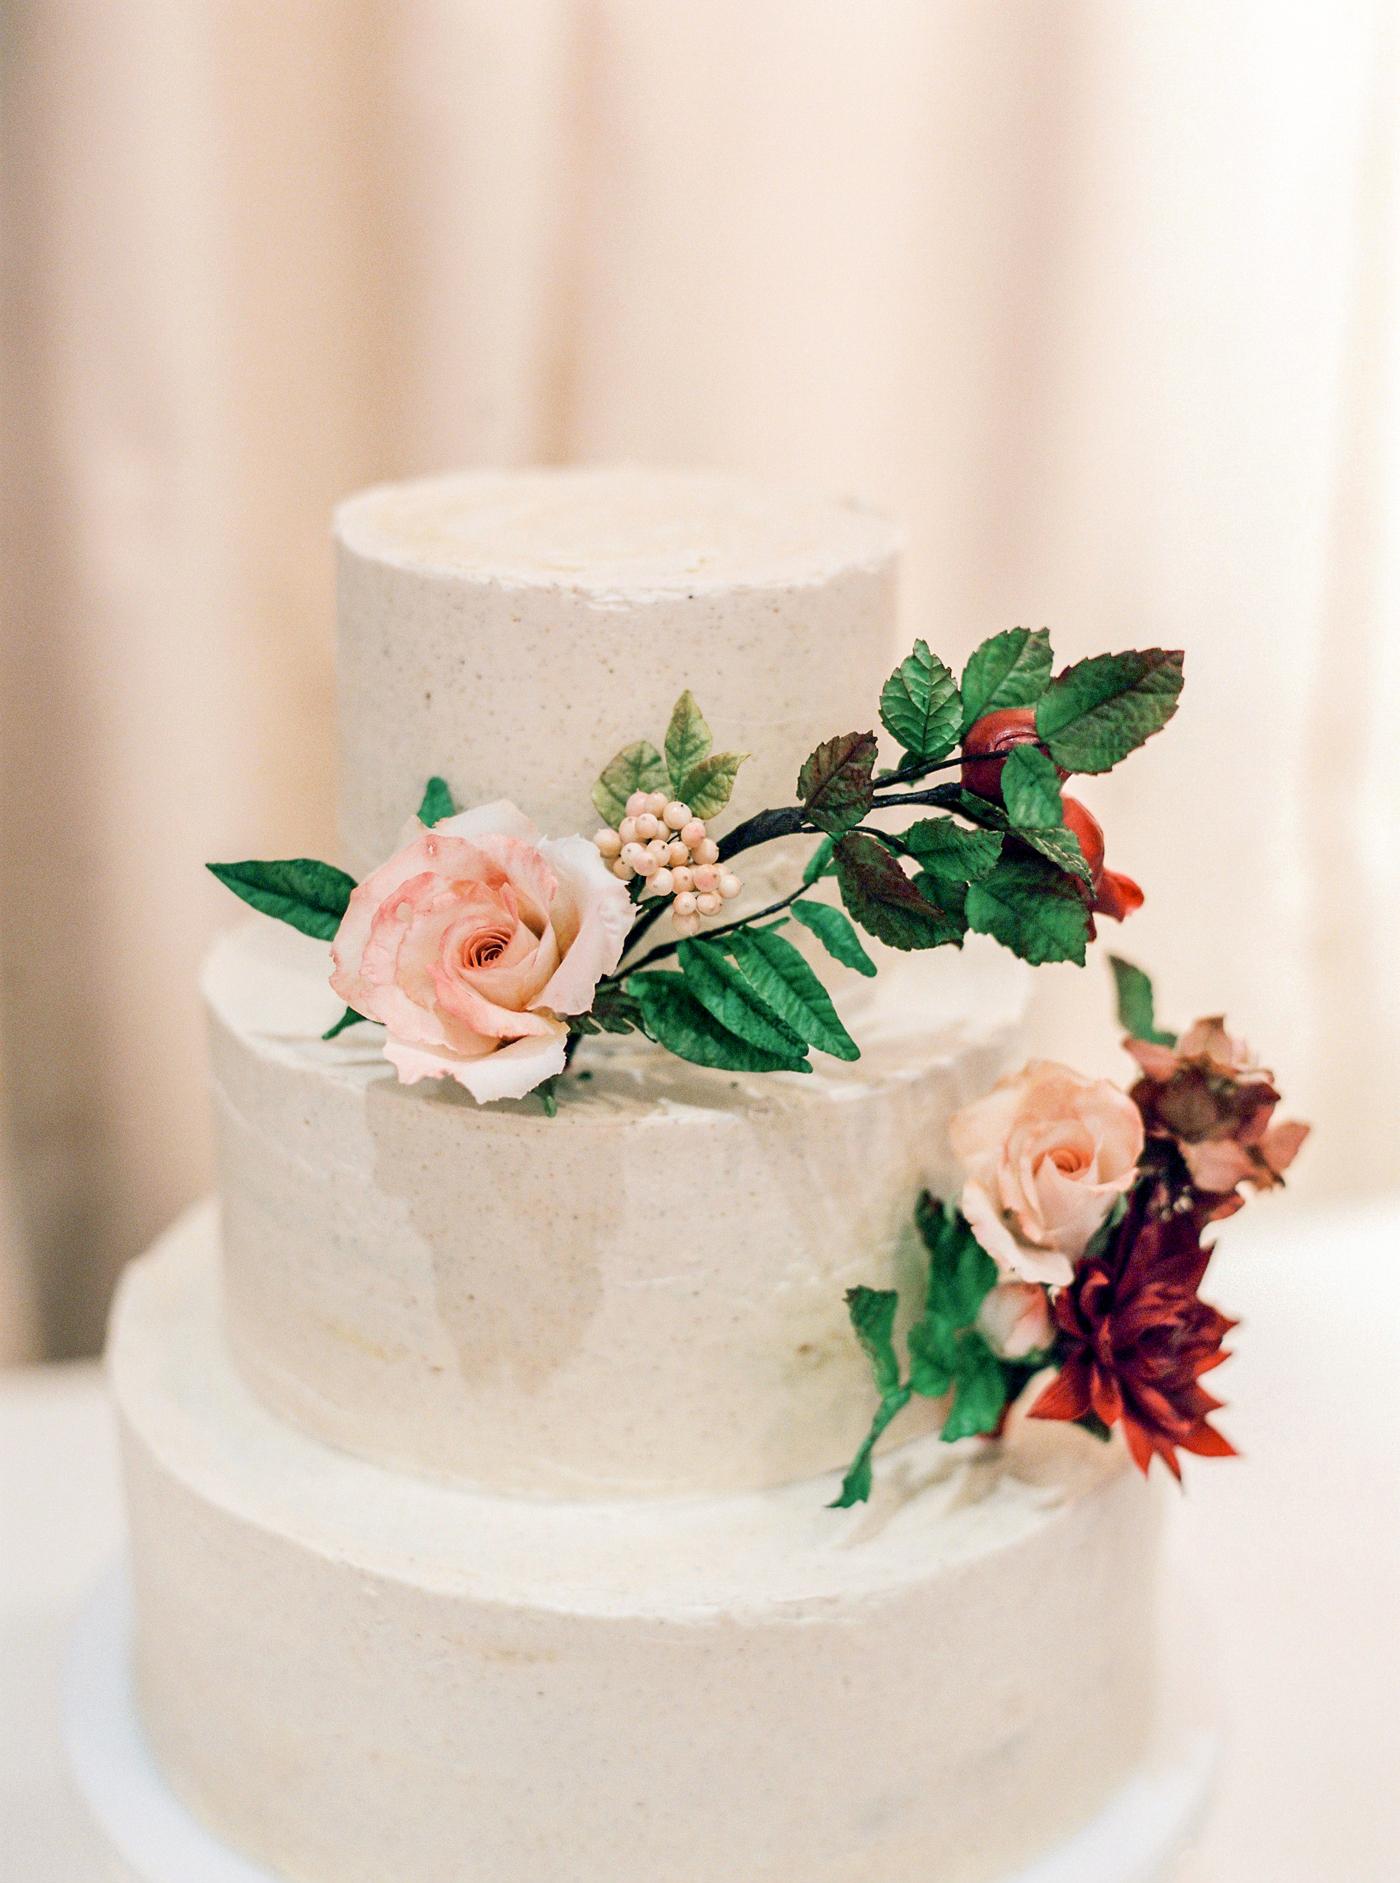 spiced vanilla bean buttercream iced three tier wedding cake with floral decor